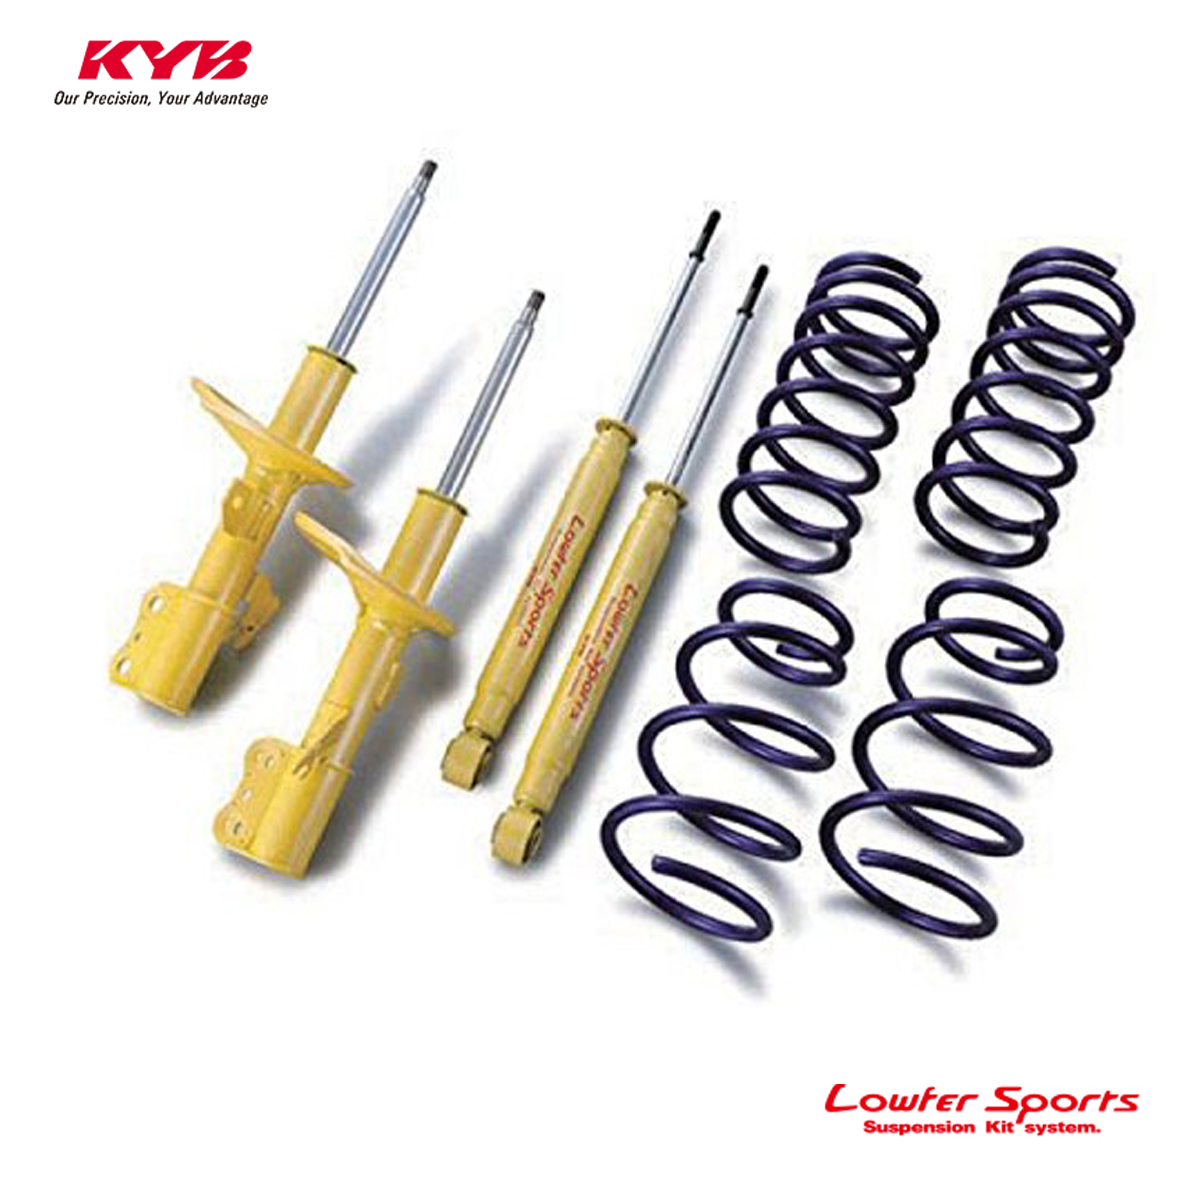 KYB カヤバ ワゴンR MC21S ショックアブソーバー サスペンションキット Lowfer Sports LKIT-MC21S 配送先条件有り